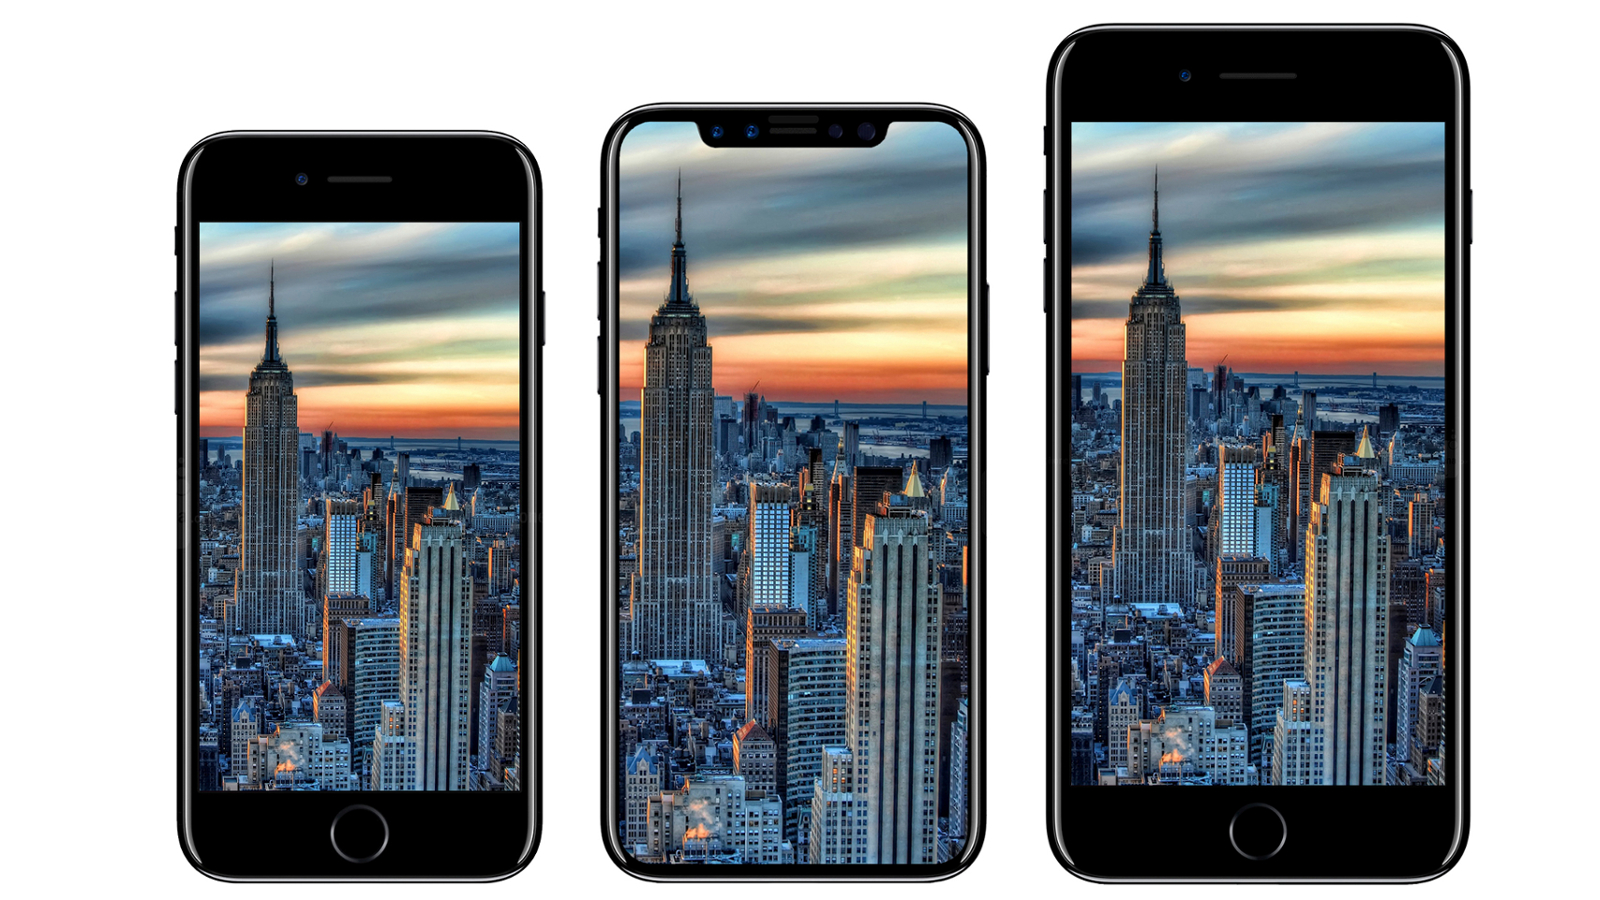 iPhone 7, iPhone 8 und iPhone 7 Plus nebeneinander